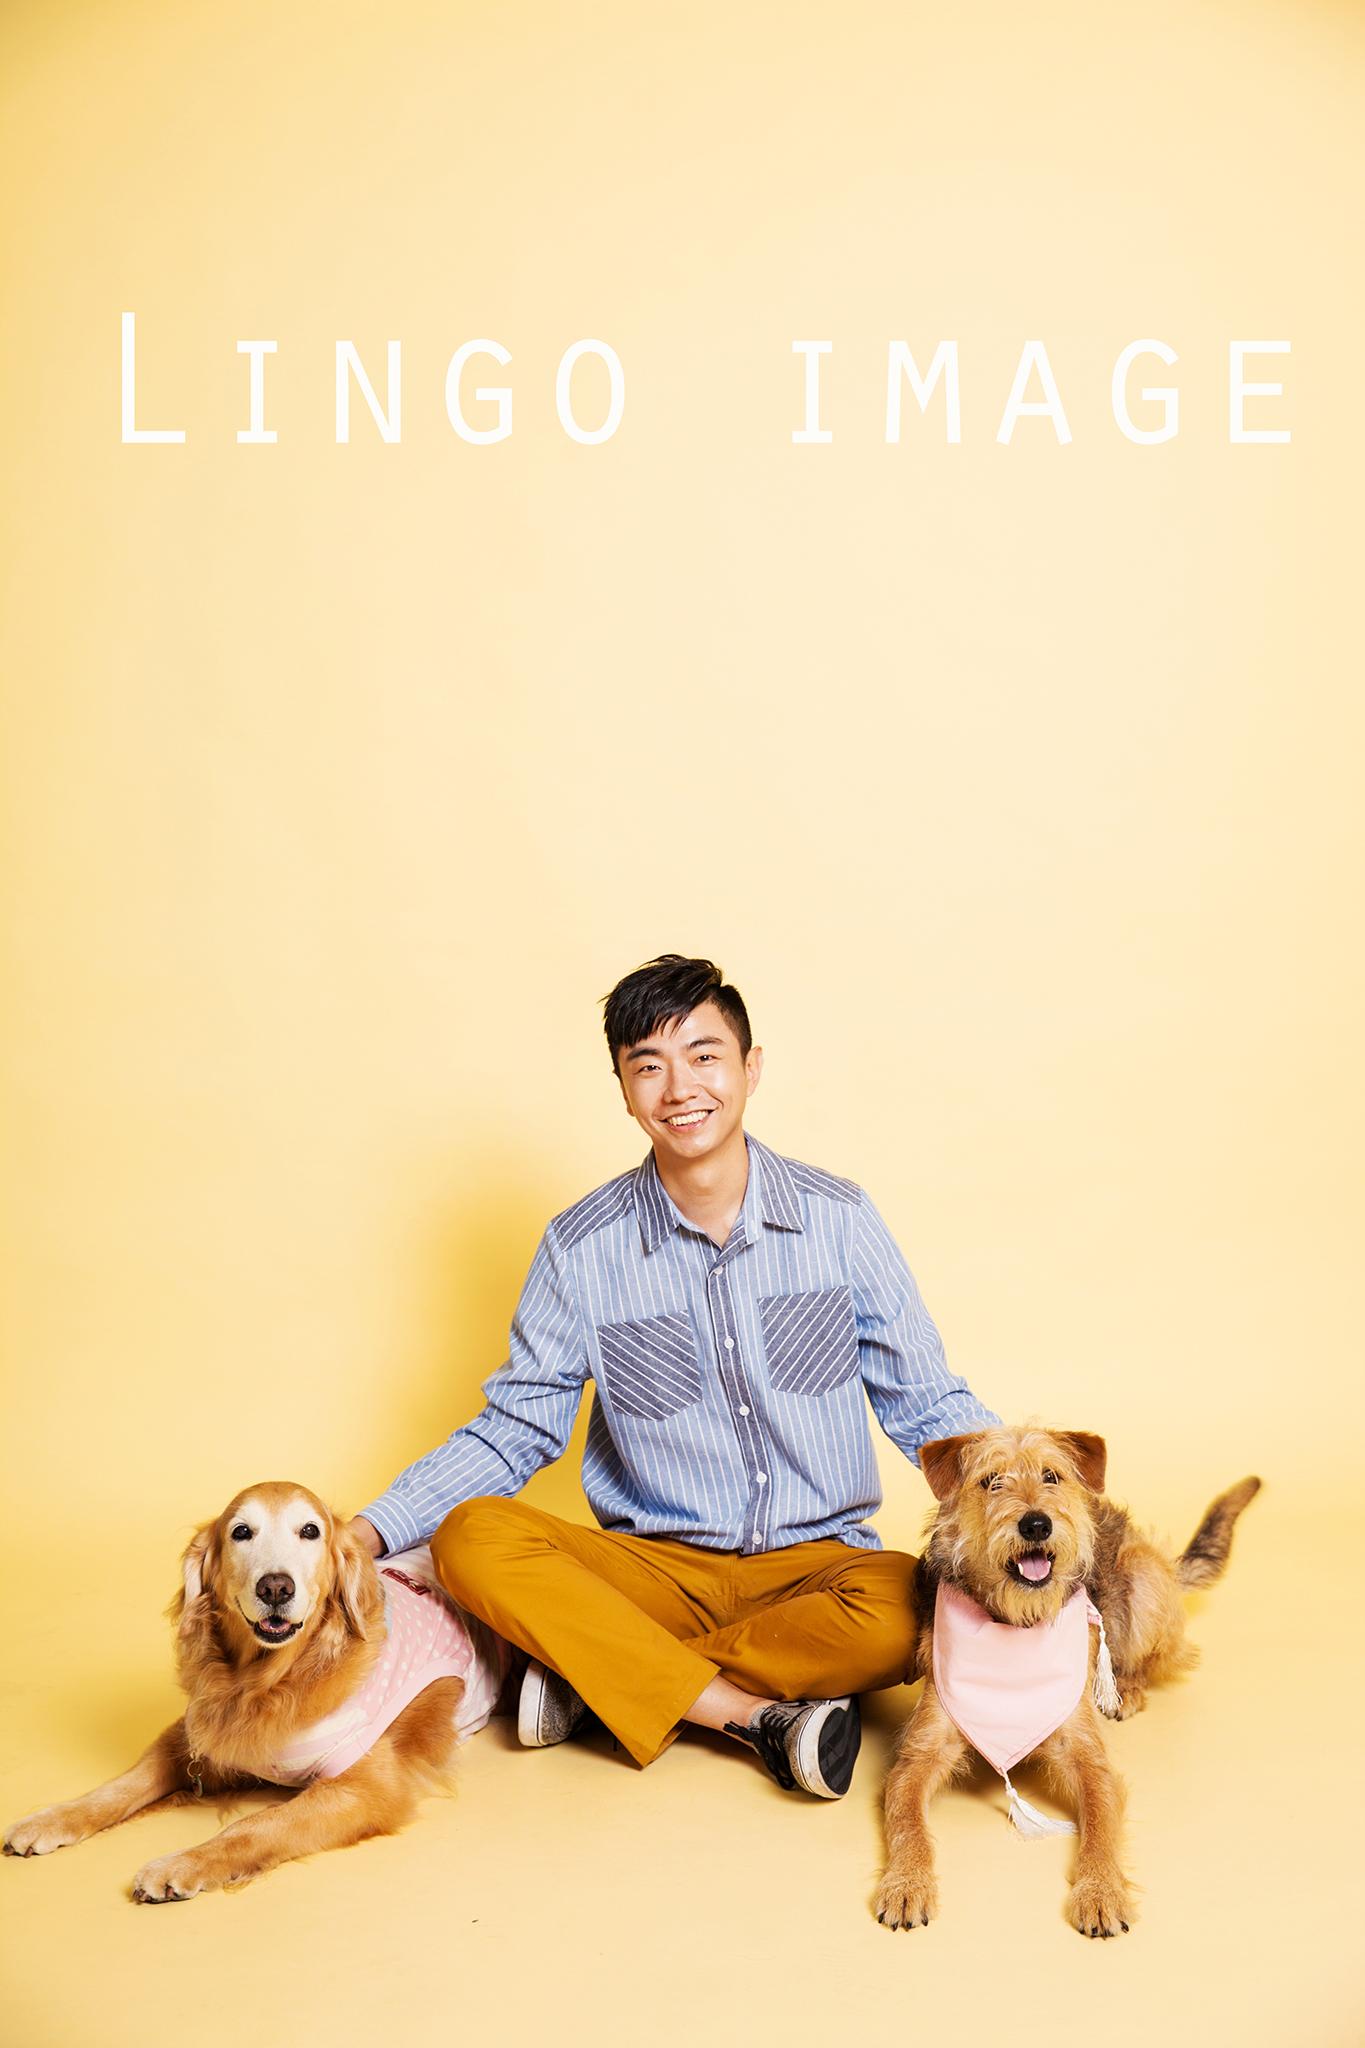 Lingo image_代言15